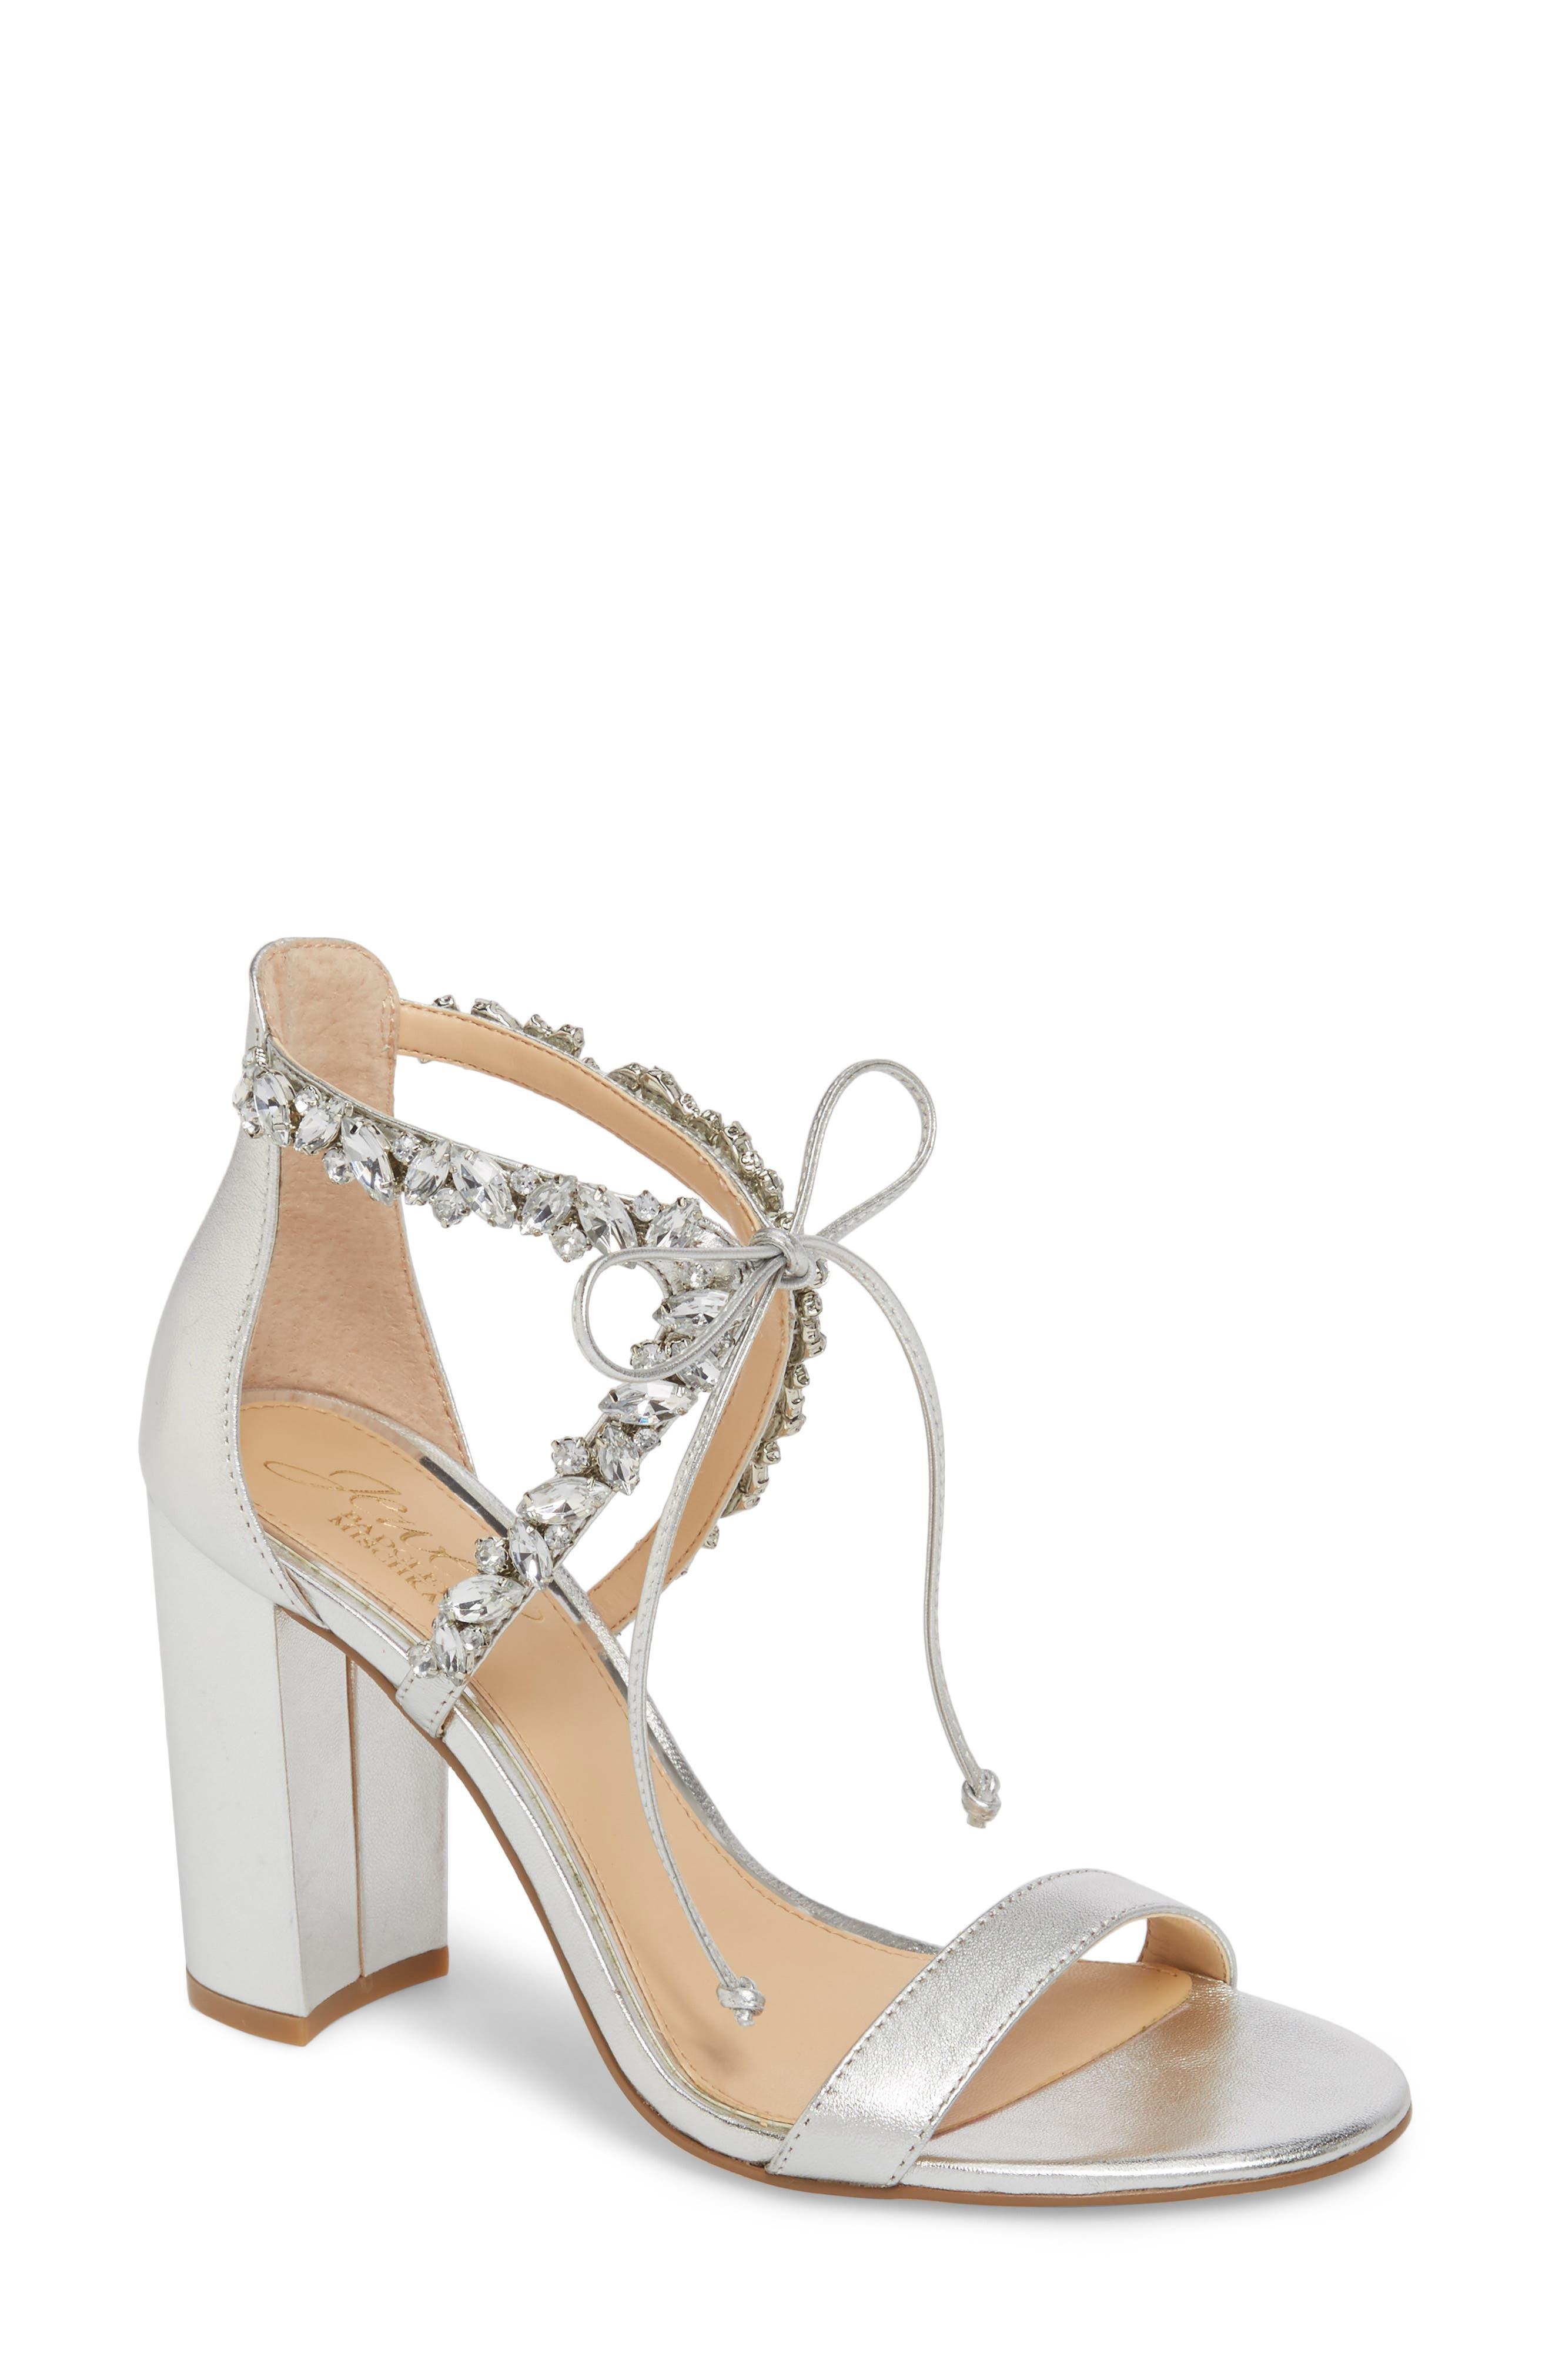 Thamar Embellished Sandal,                         Main,                         color, Silver Leather